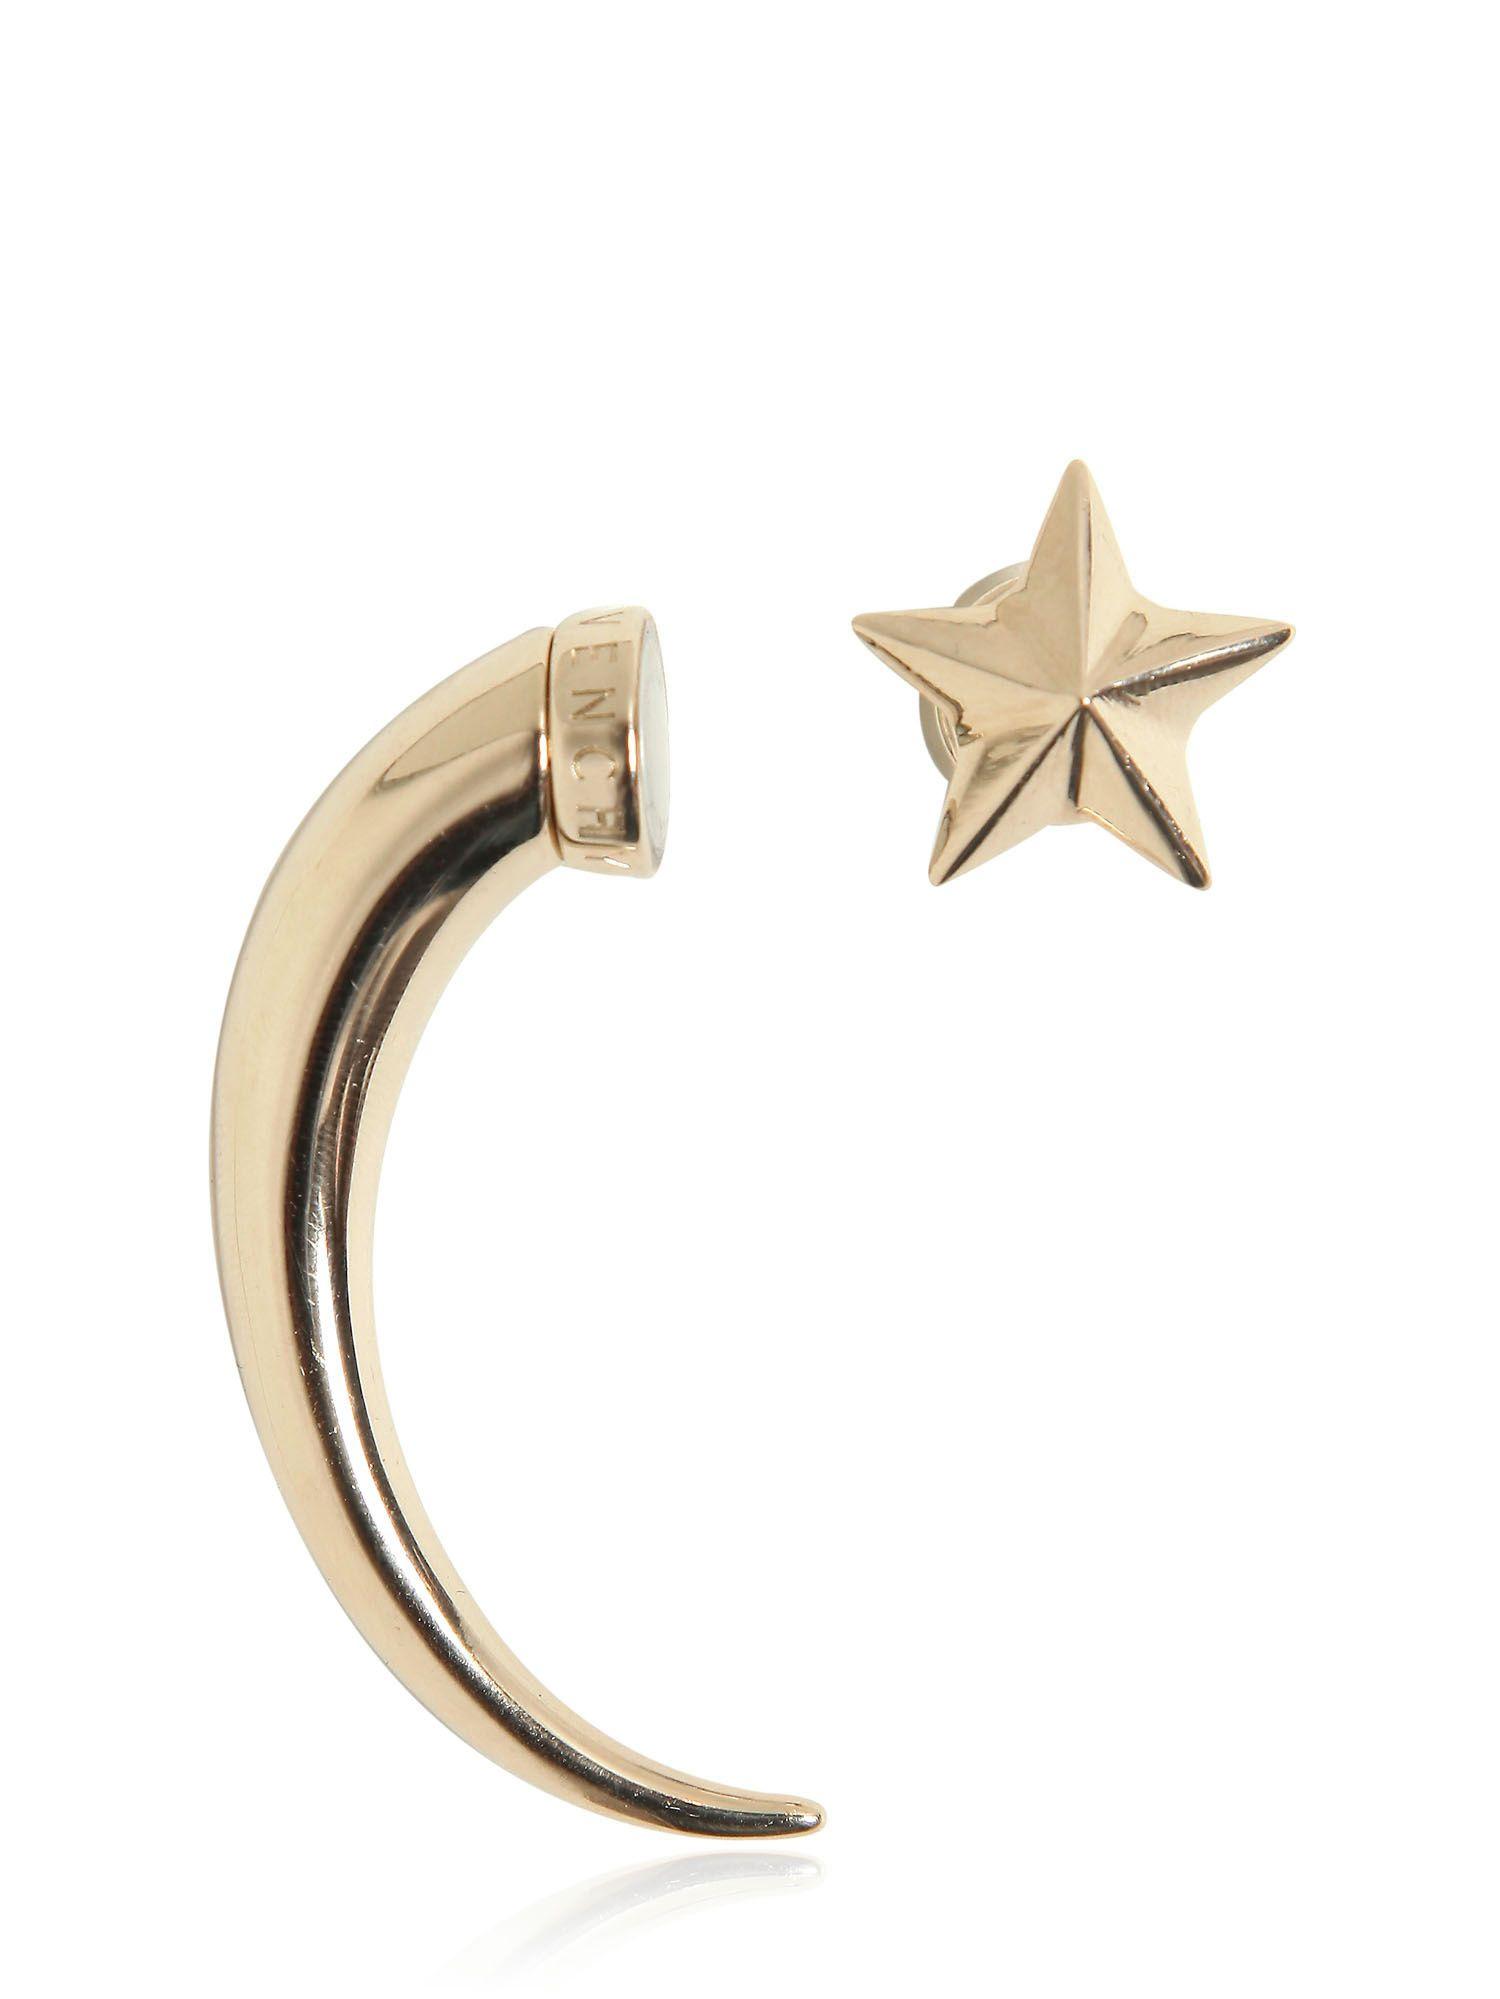 Givenchy single horn earring affäre flirtet mit anderen frauen - Journey to Valbona